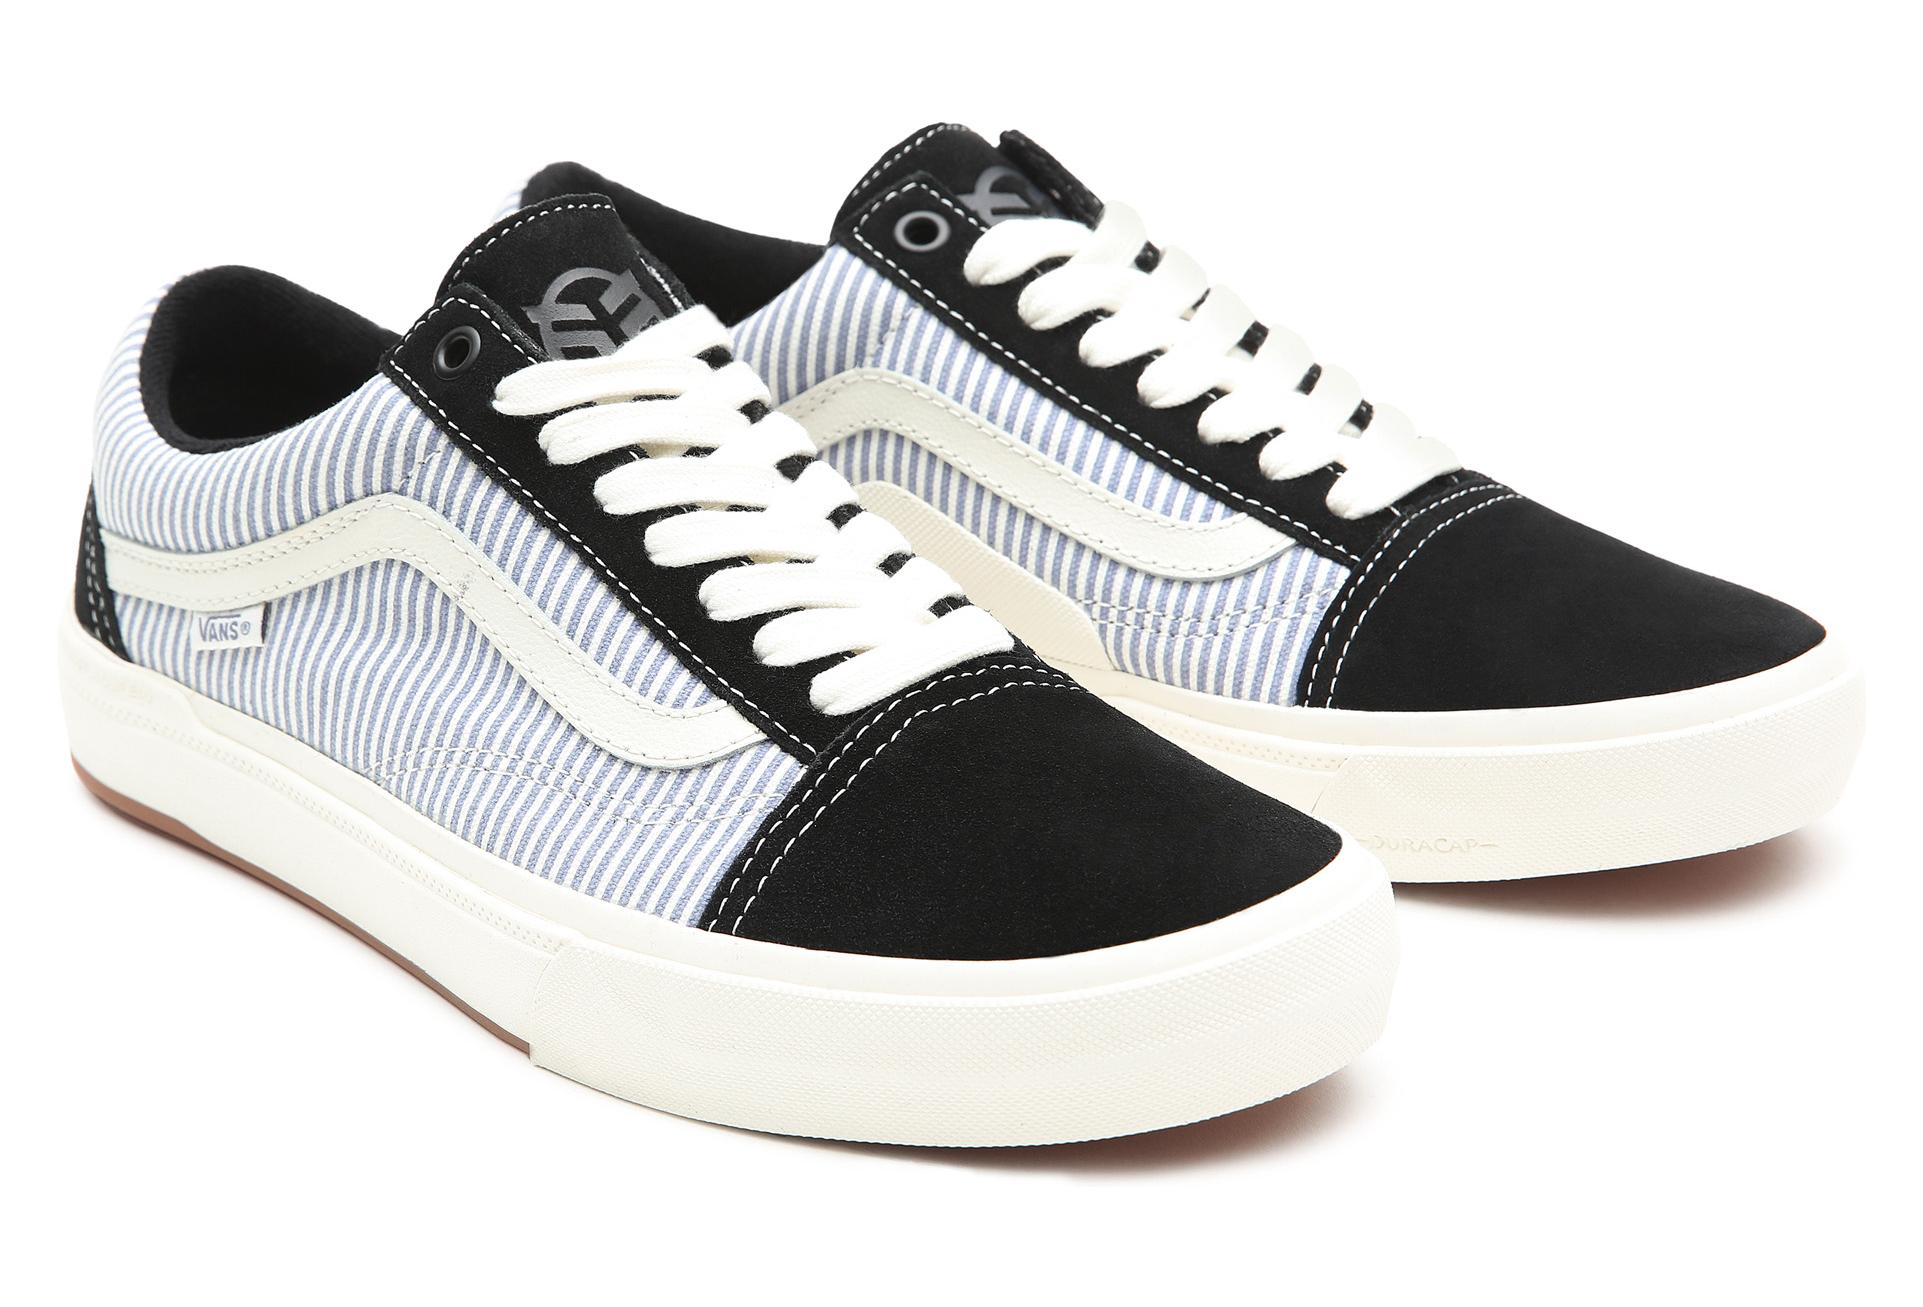 Chaussures Vans Old Skool Federal Noir / Bleu | Alltricks.fr